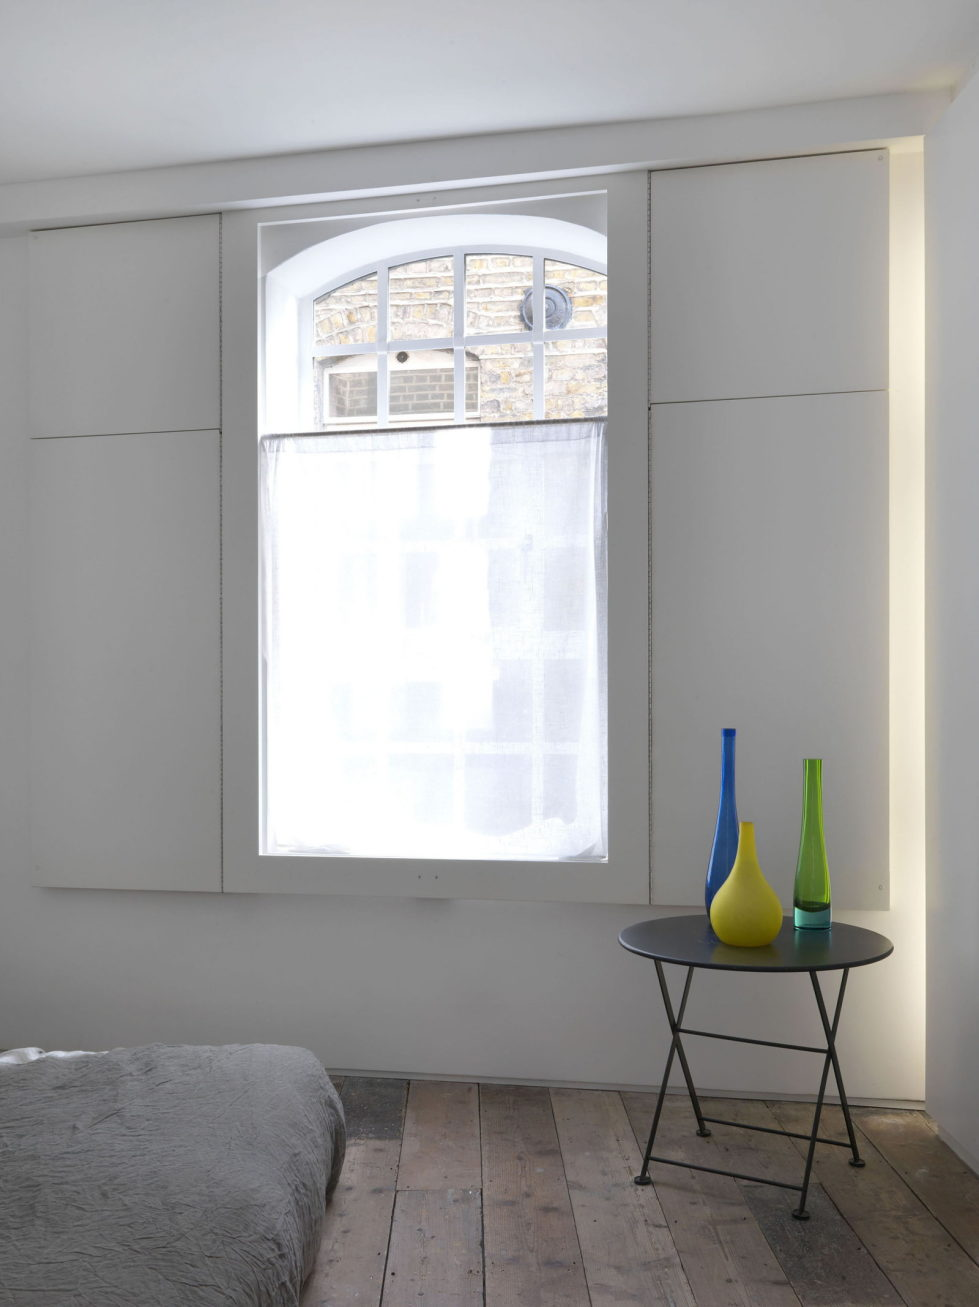 Loft - a warehouse in Bermondsey district - Bedroom decor